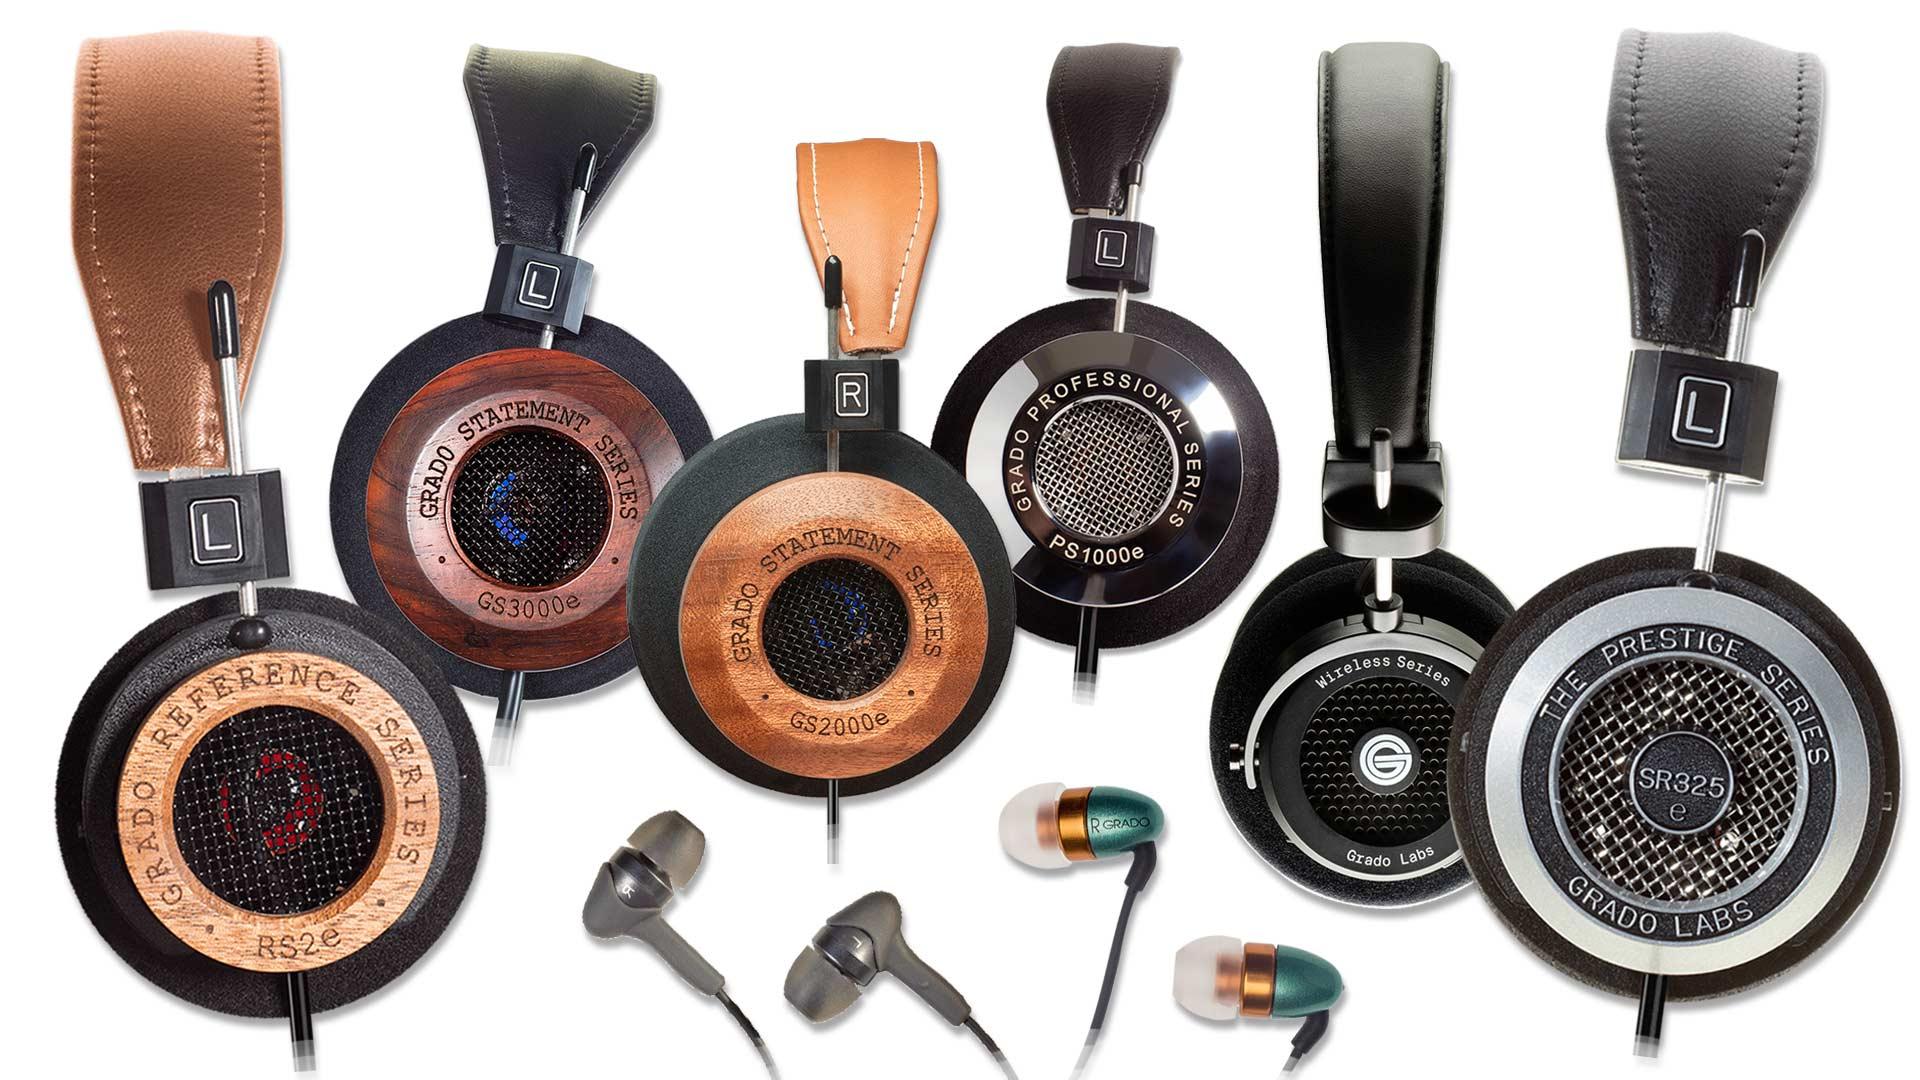 Full Grado Labs Product Range | Unilet Sound & Vision